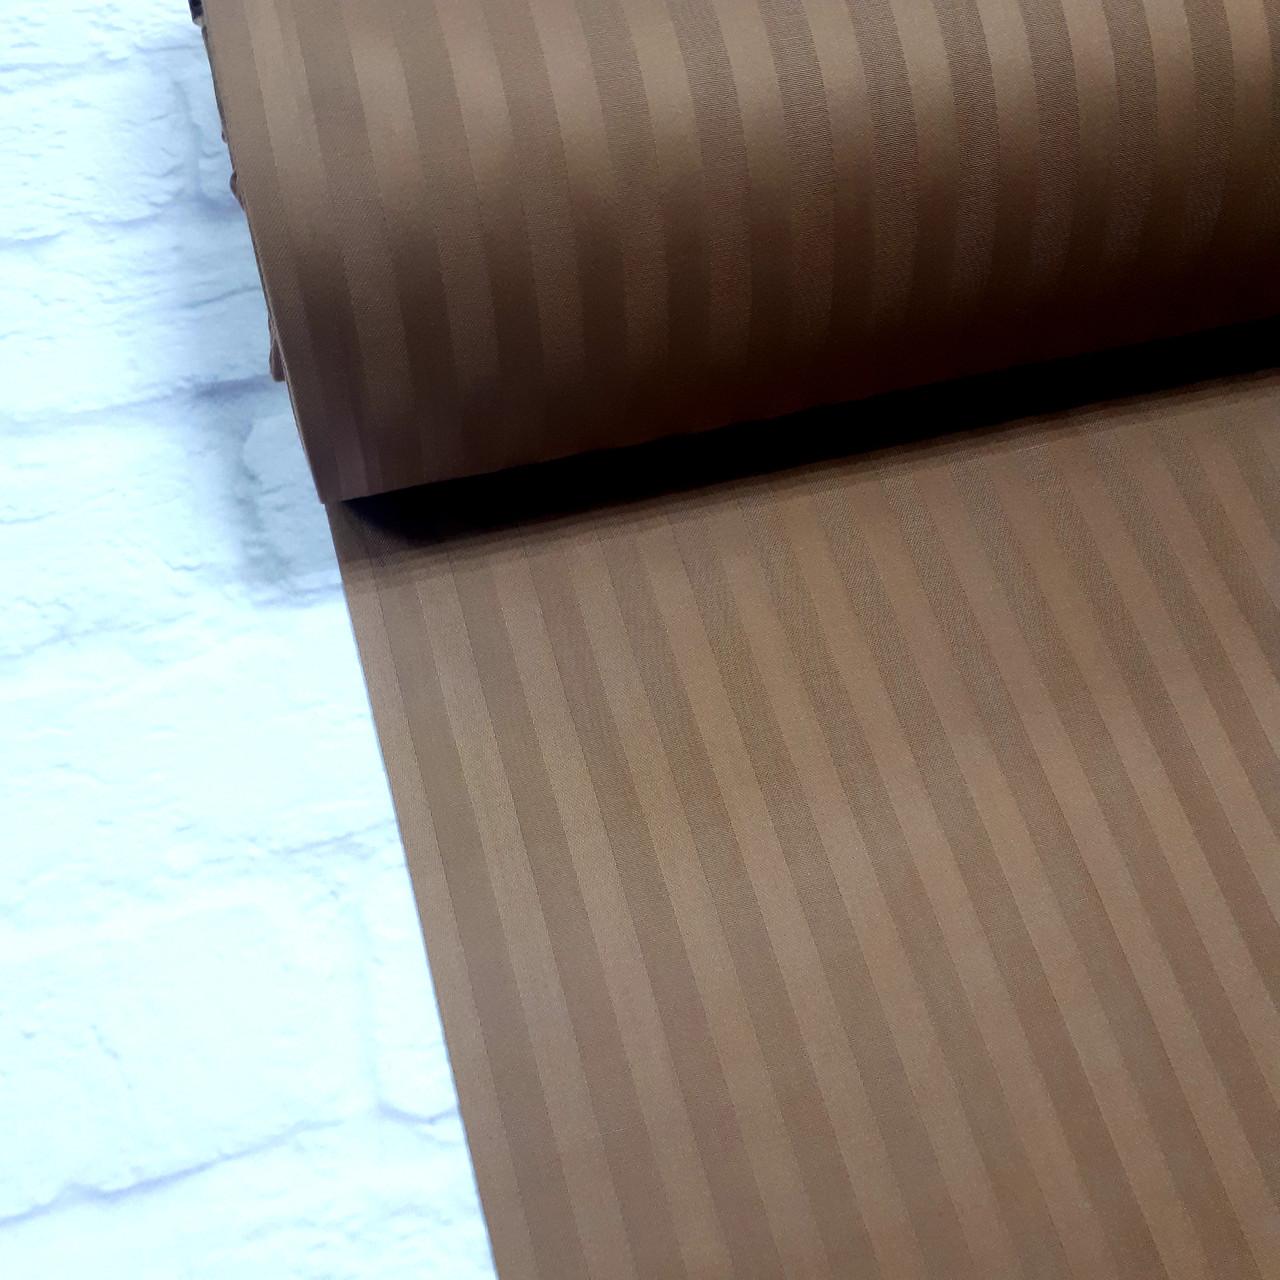 Сатин 100% хлопок  (ТУРЦИЯ шир. 2,4 м) Stripes коричневый №8 Отрез(1*2,4м)